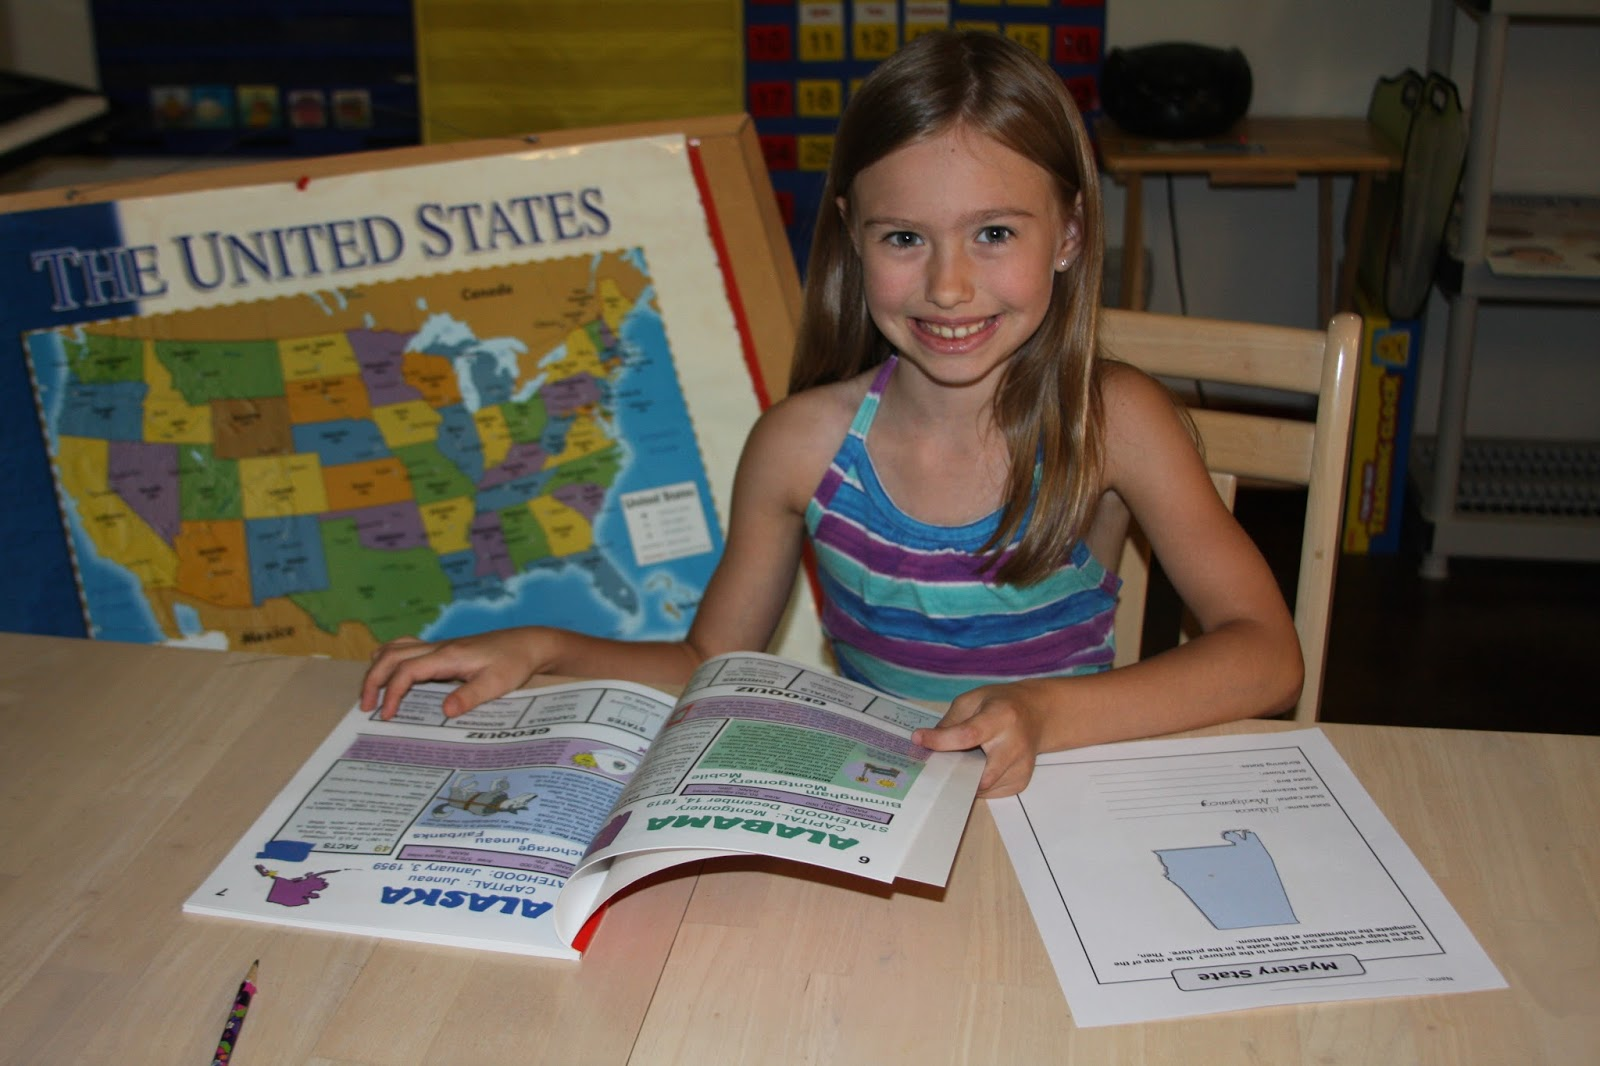 math worksheet : a learning journey september 2015 : Super Teacher Worksheets Division